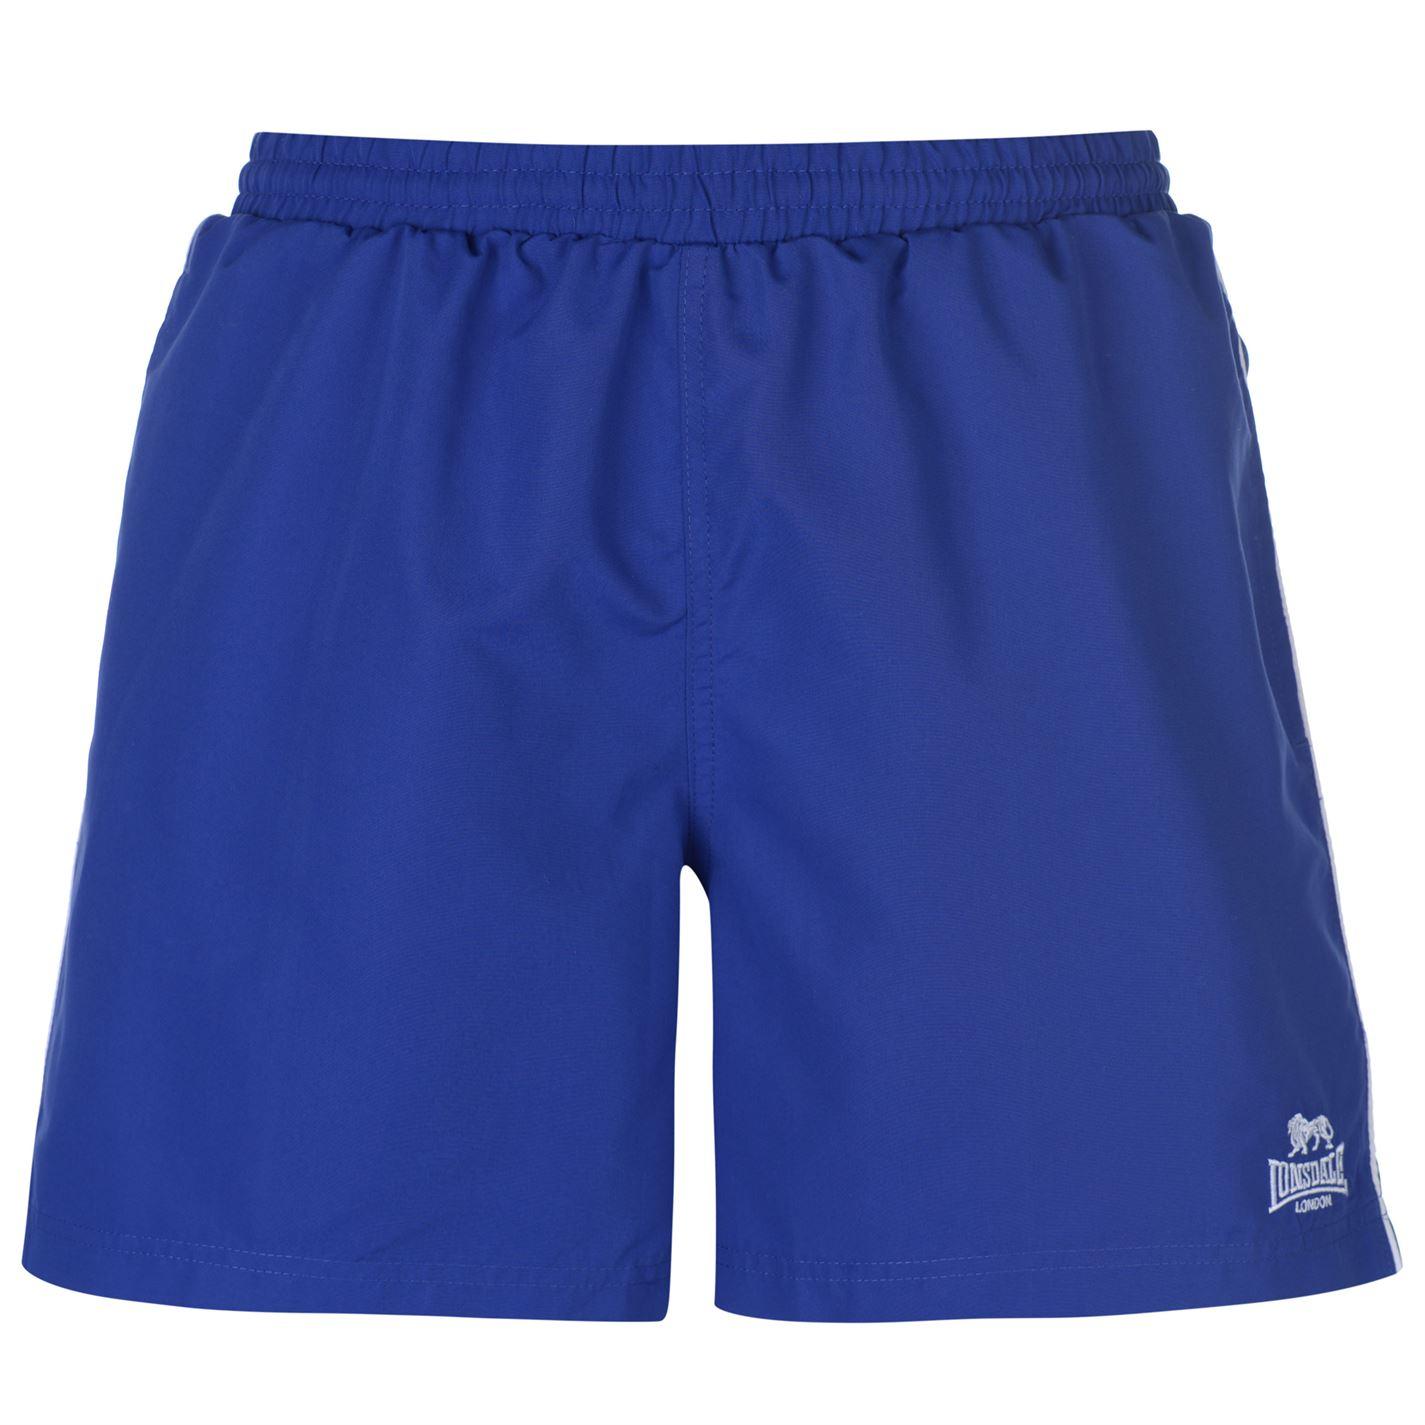 Lonsdale Swim Shorts Mens